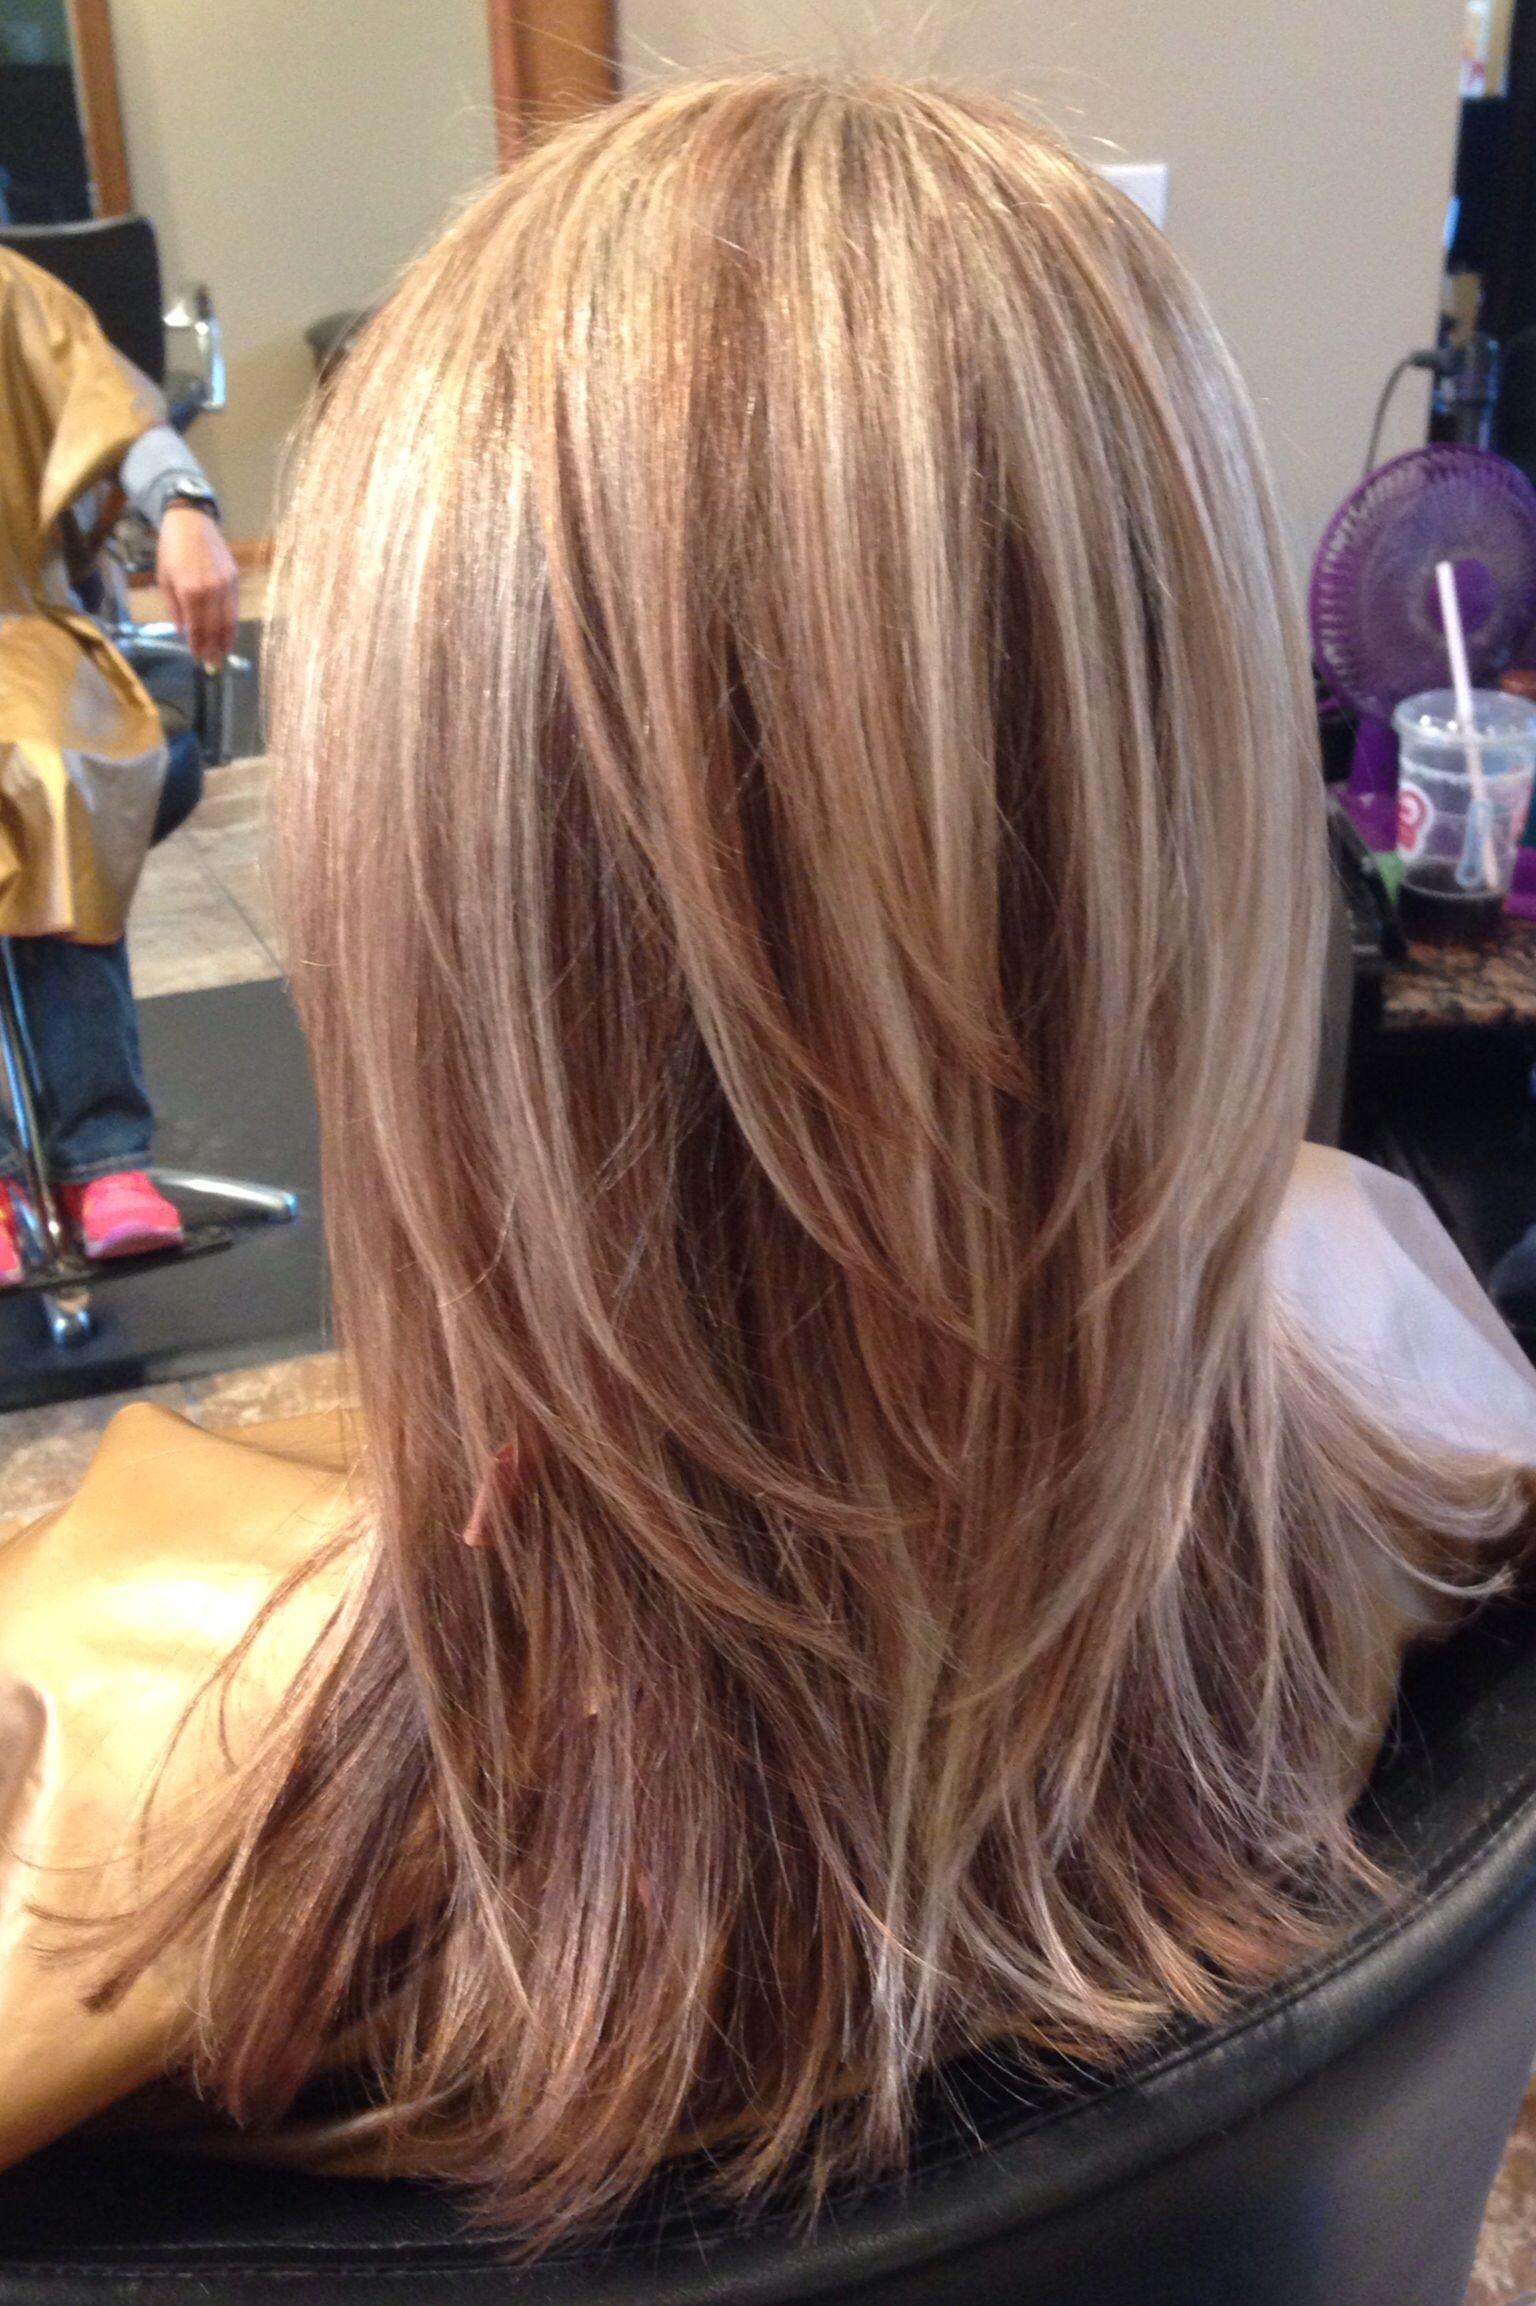 Pin By Ashley Brooke On My Work Medium Hair Styles Hair Styles Hair Highlights